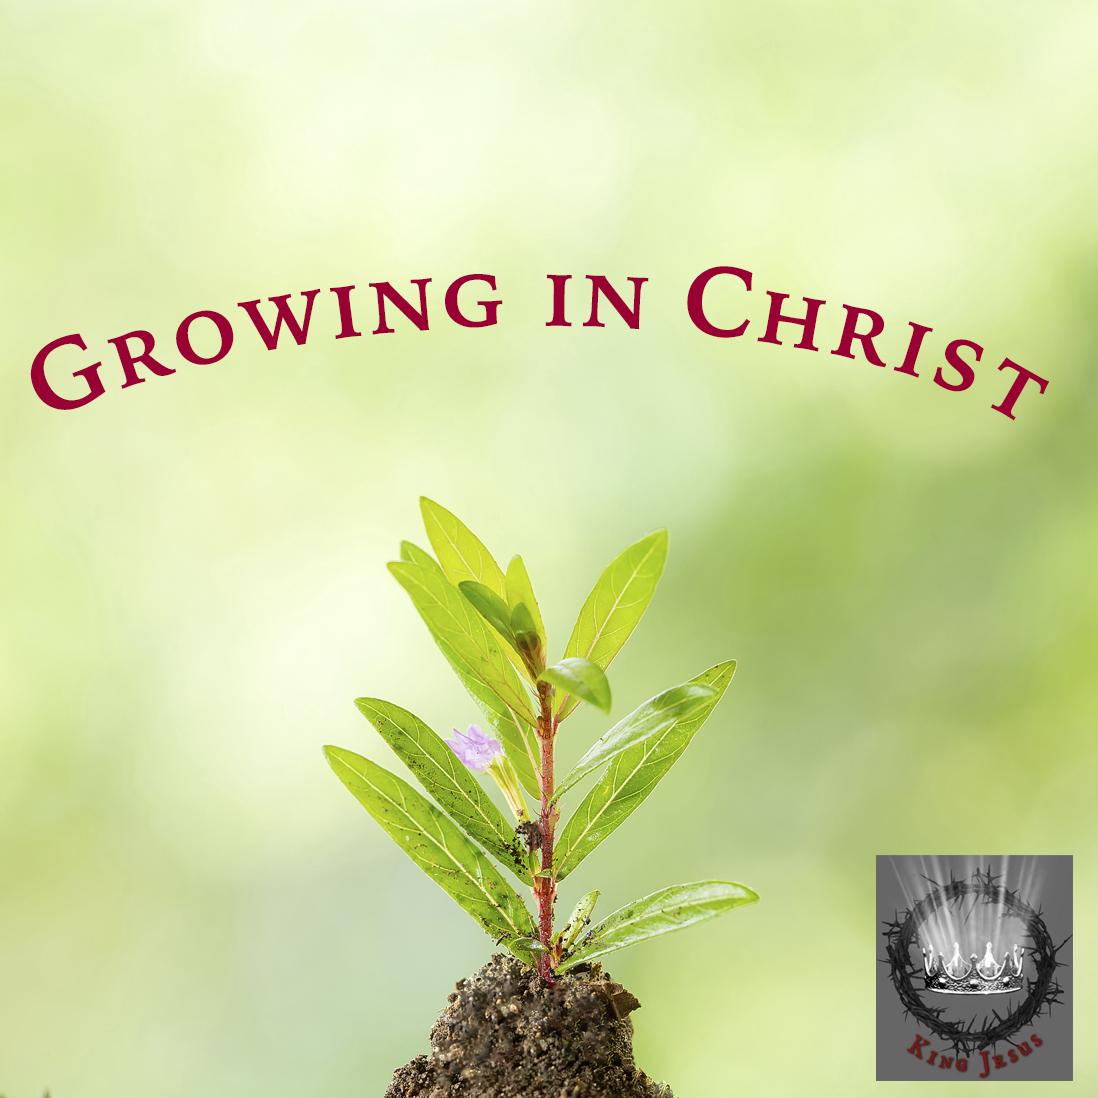 01.03.21 Mountain of Glory (King Jesus: The Gospel of Matthew – Part 43)